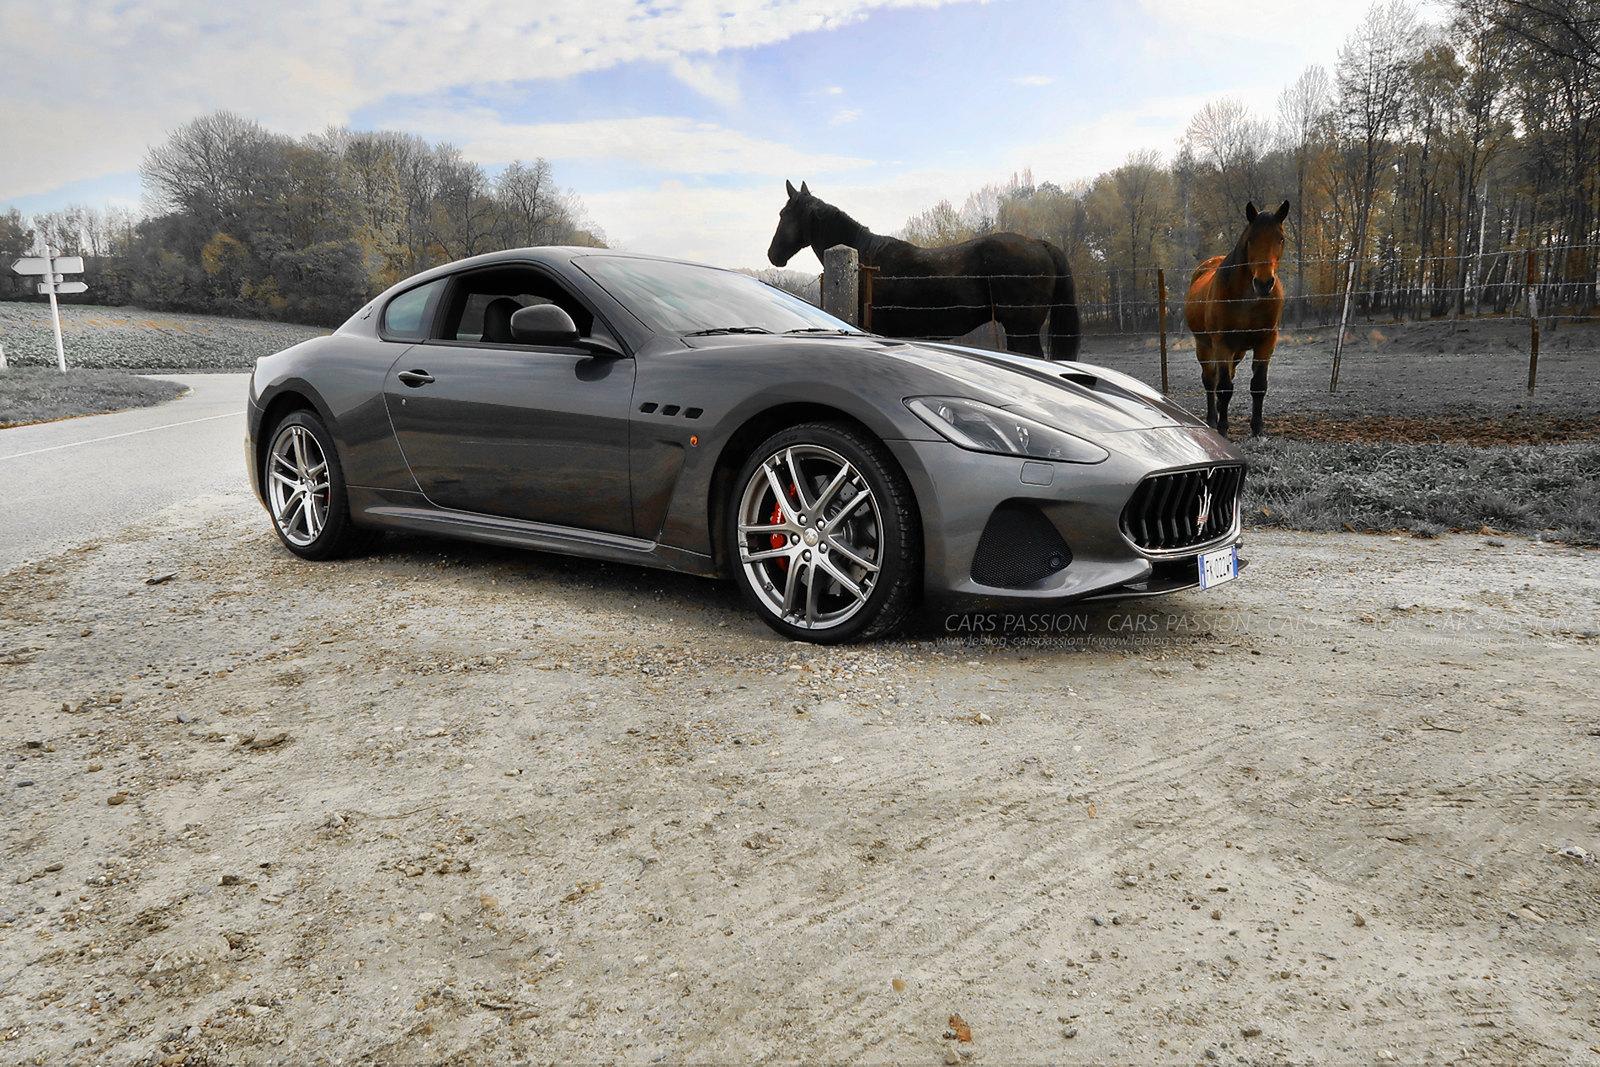 Journée essai gamme Maserati